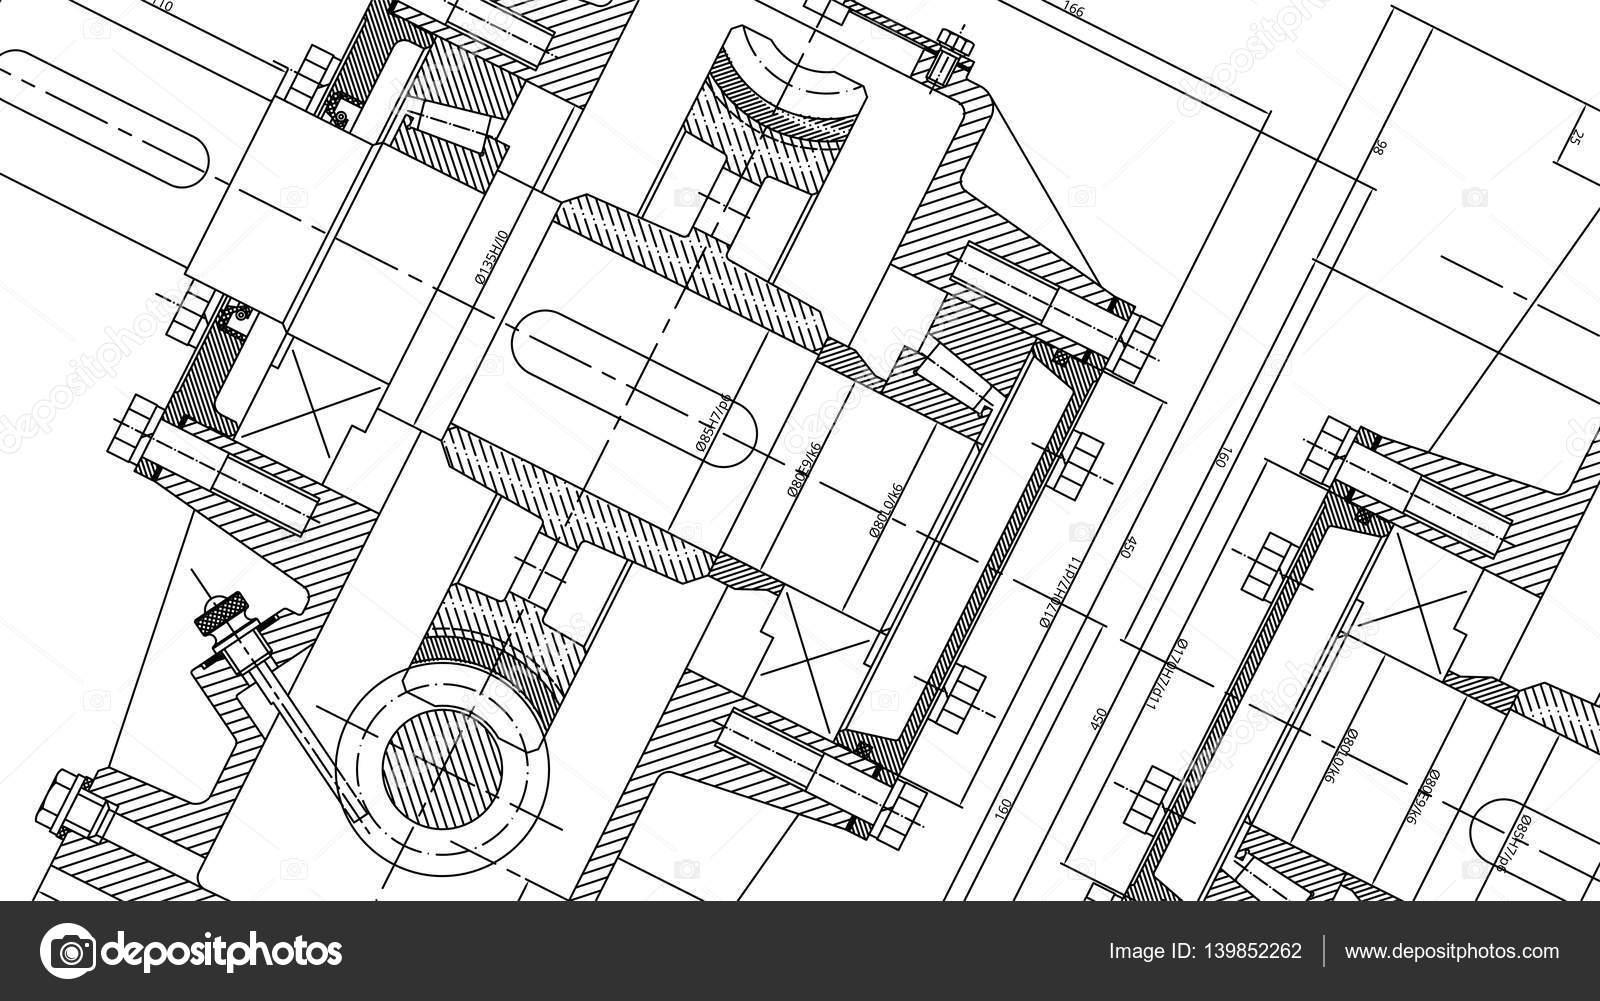 Mechanical Engineering drawing. Engineering Drawing